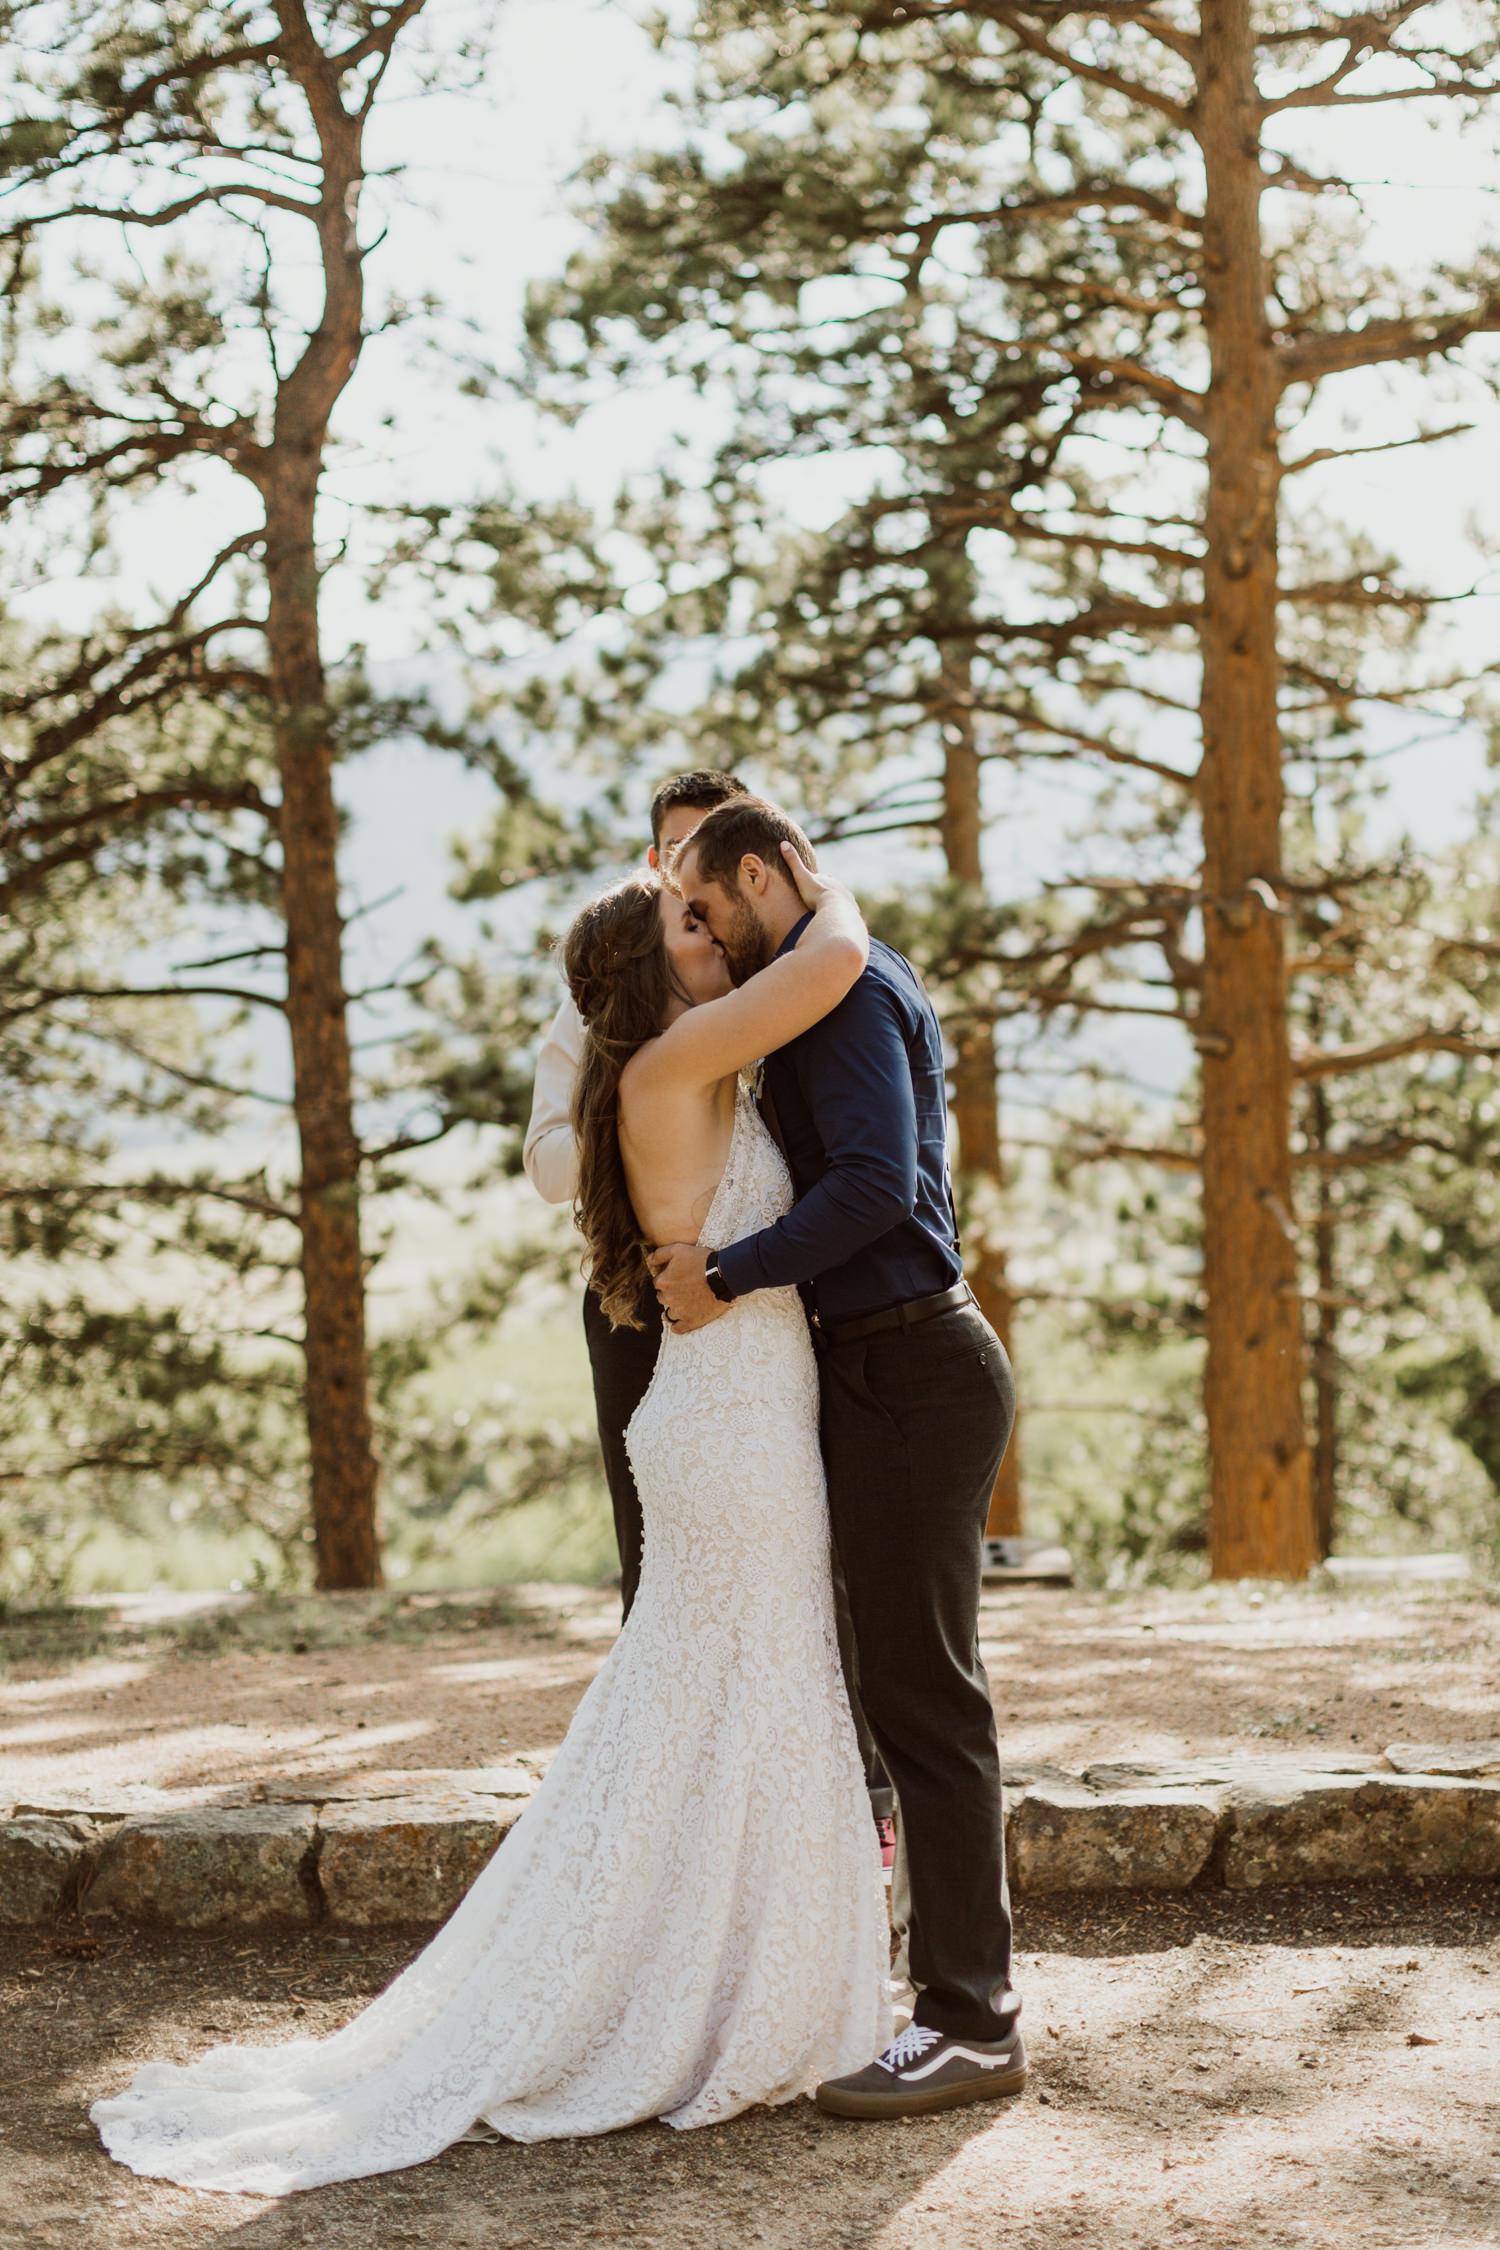 rocky-mountain-national-park-wedding-27.jpg